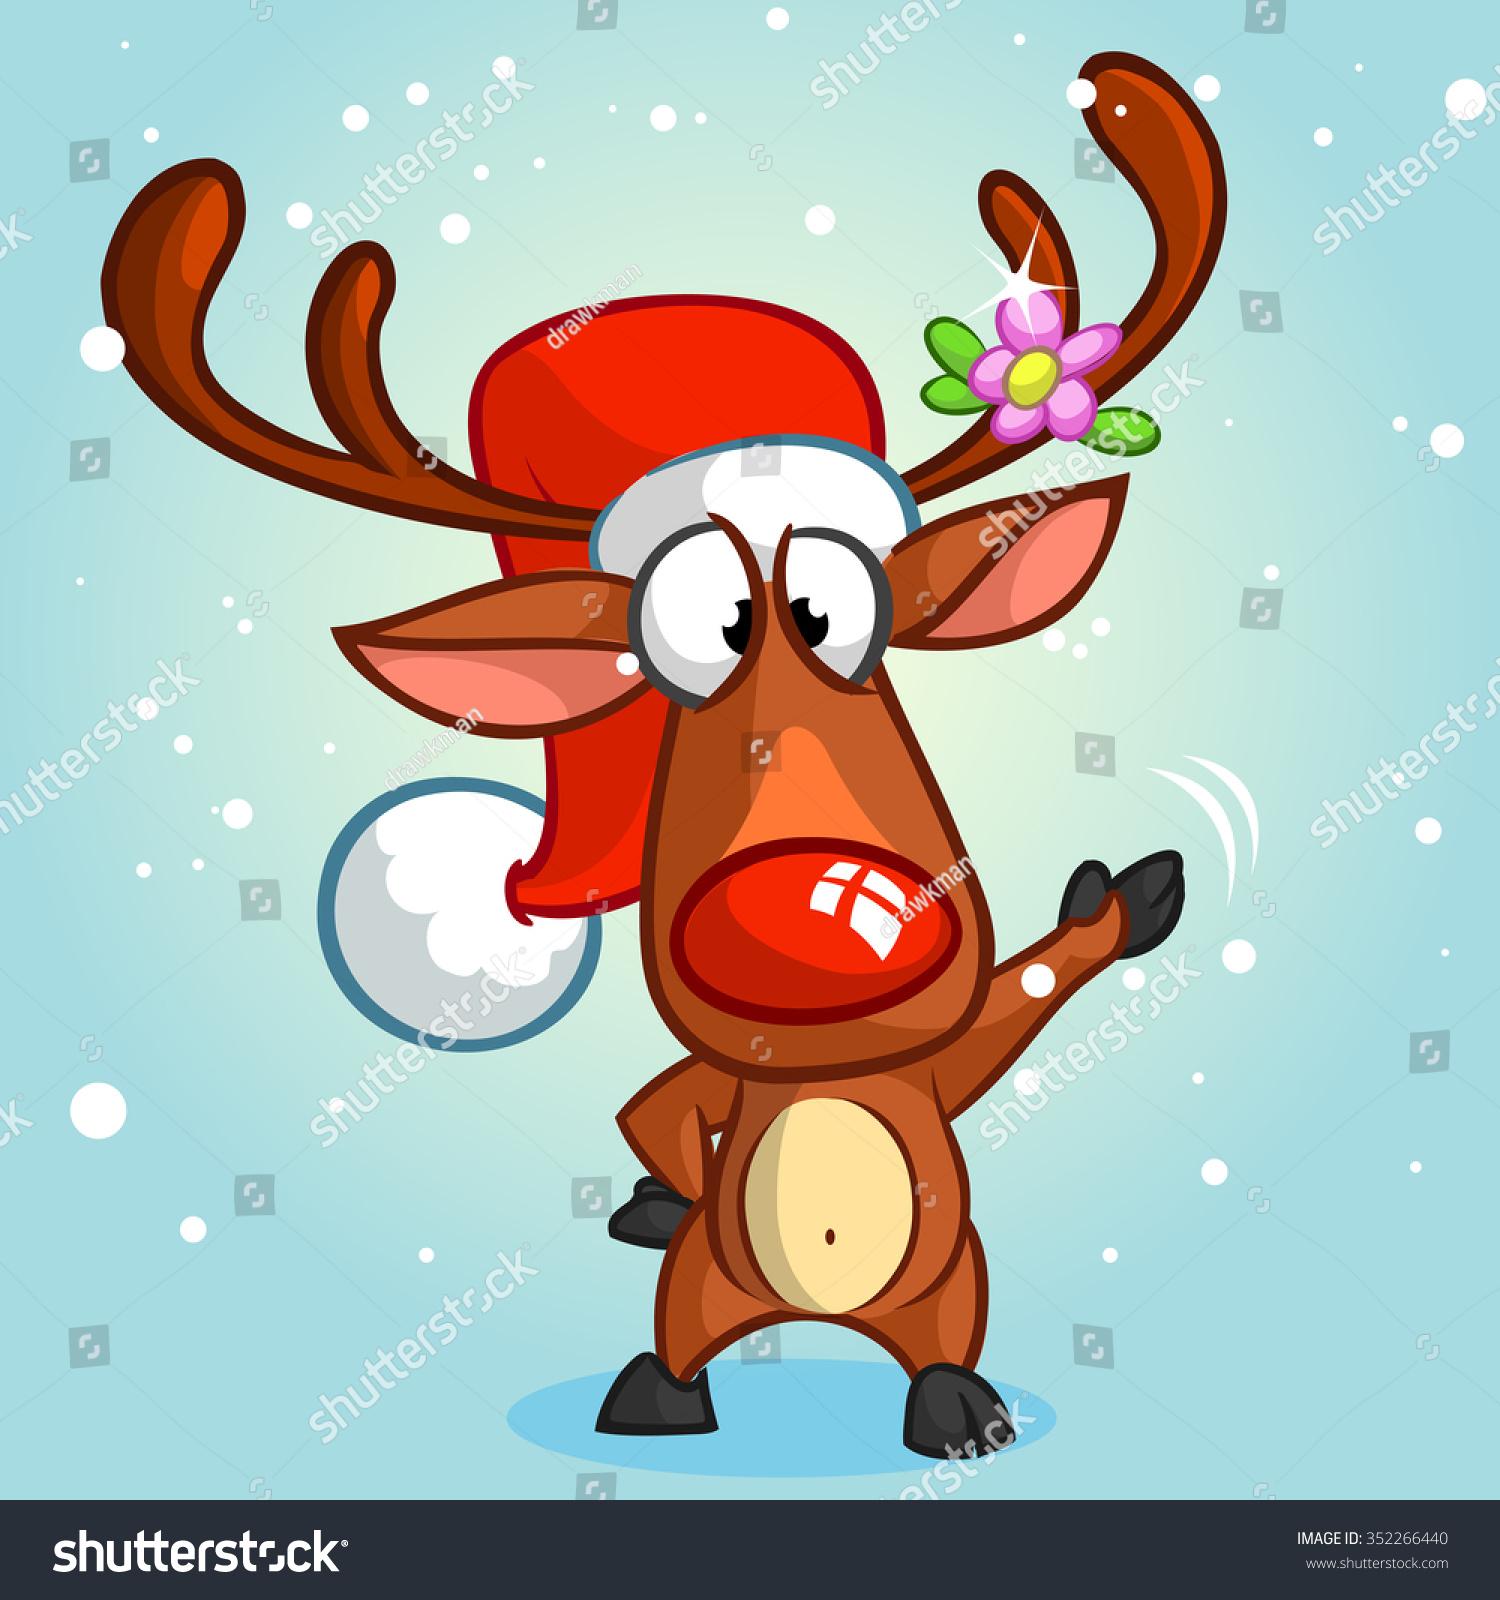 Rudolph the Animated Series/Cast | TV Fanon Wiki | FANDOM ...